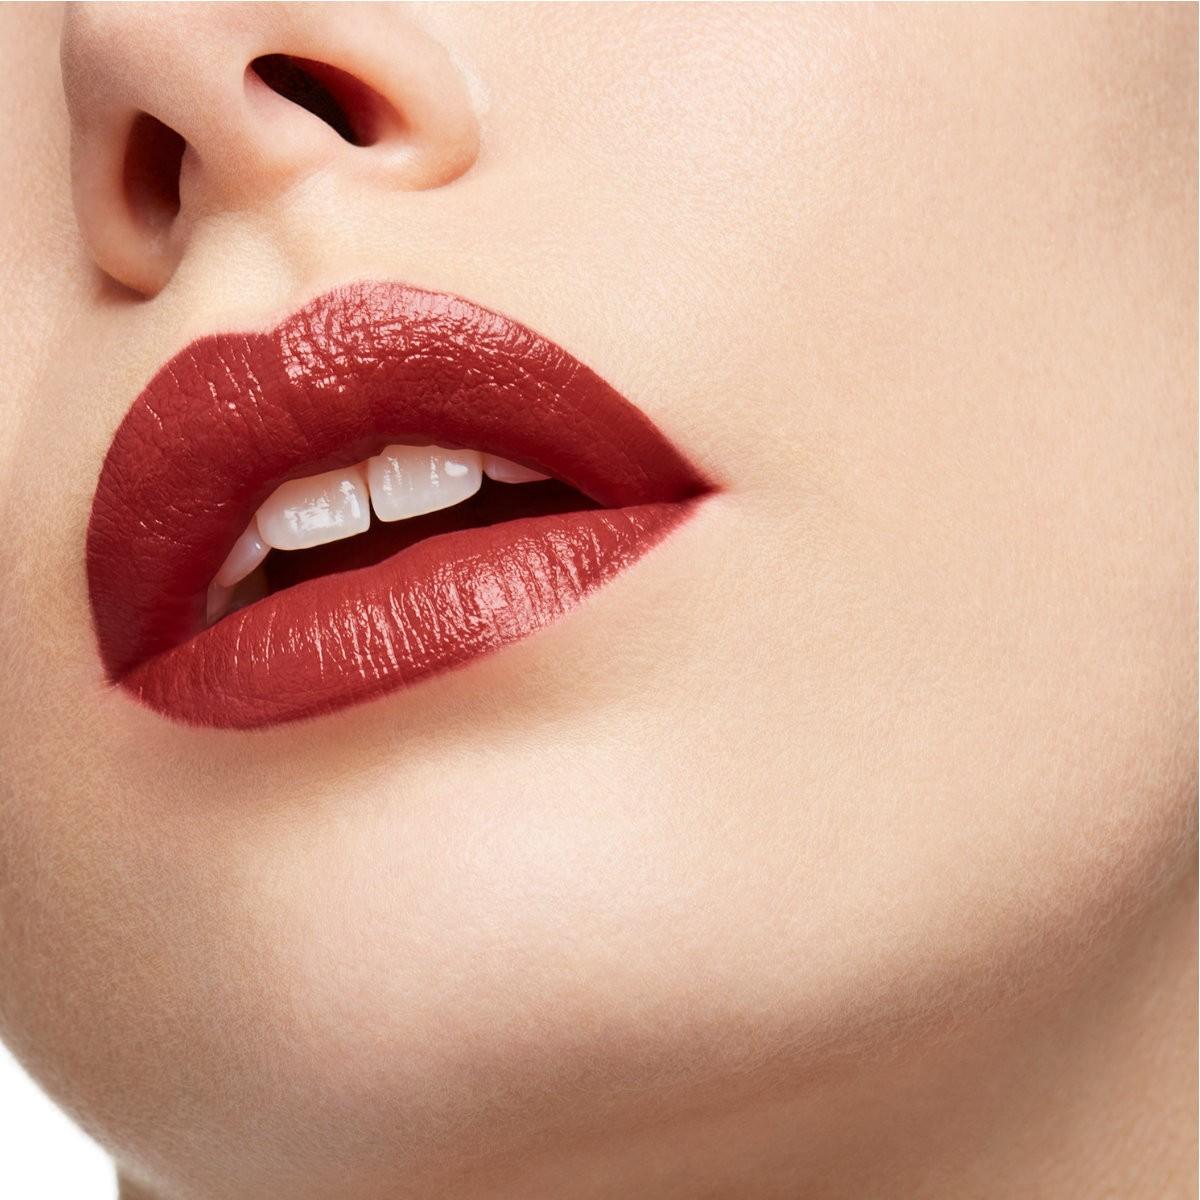 Beauty - Farida - Christian Louboutin